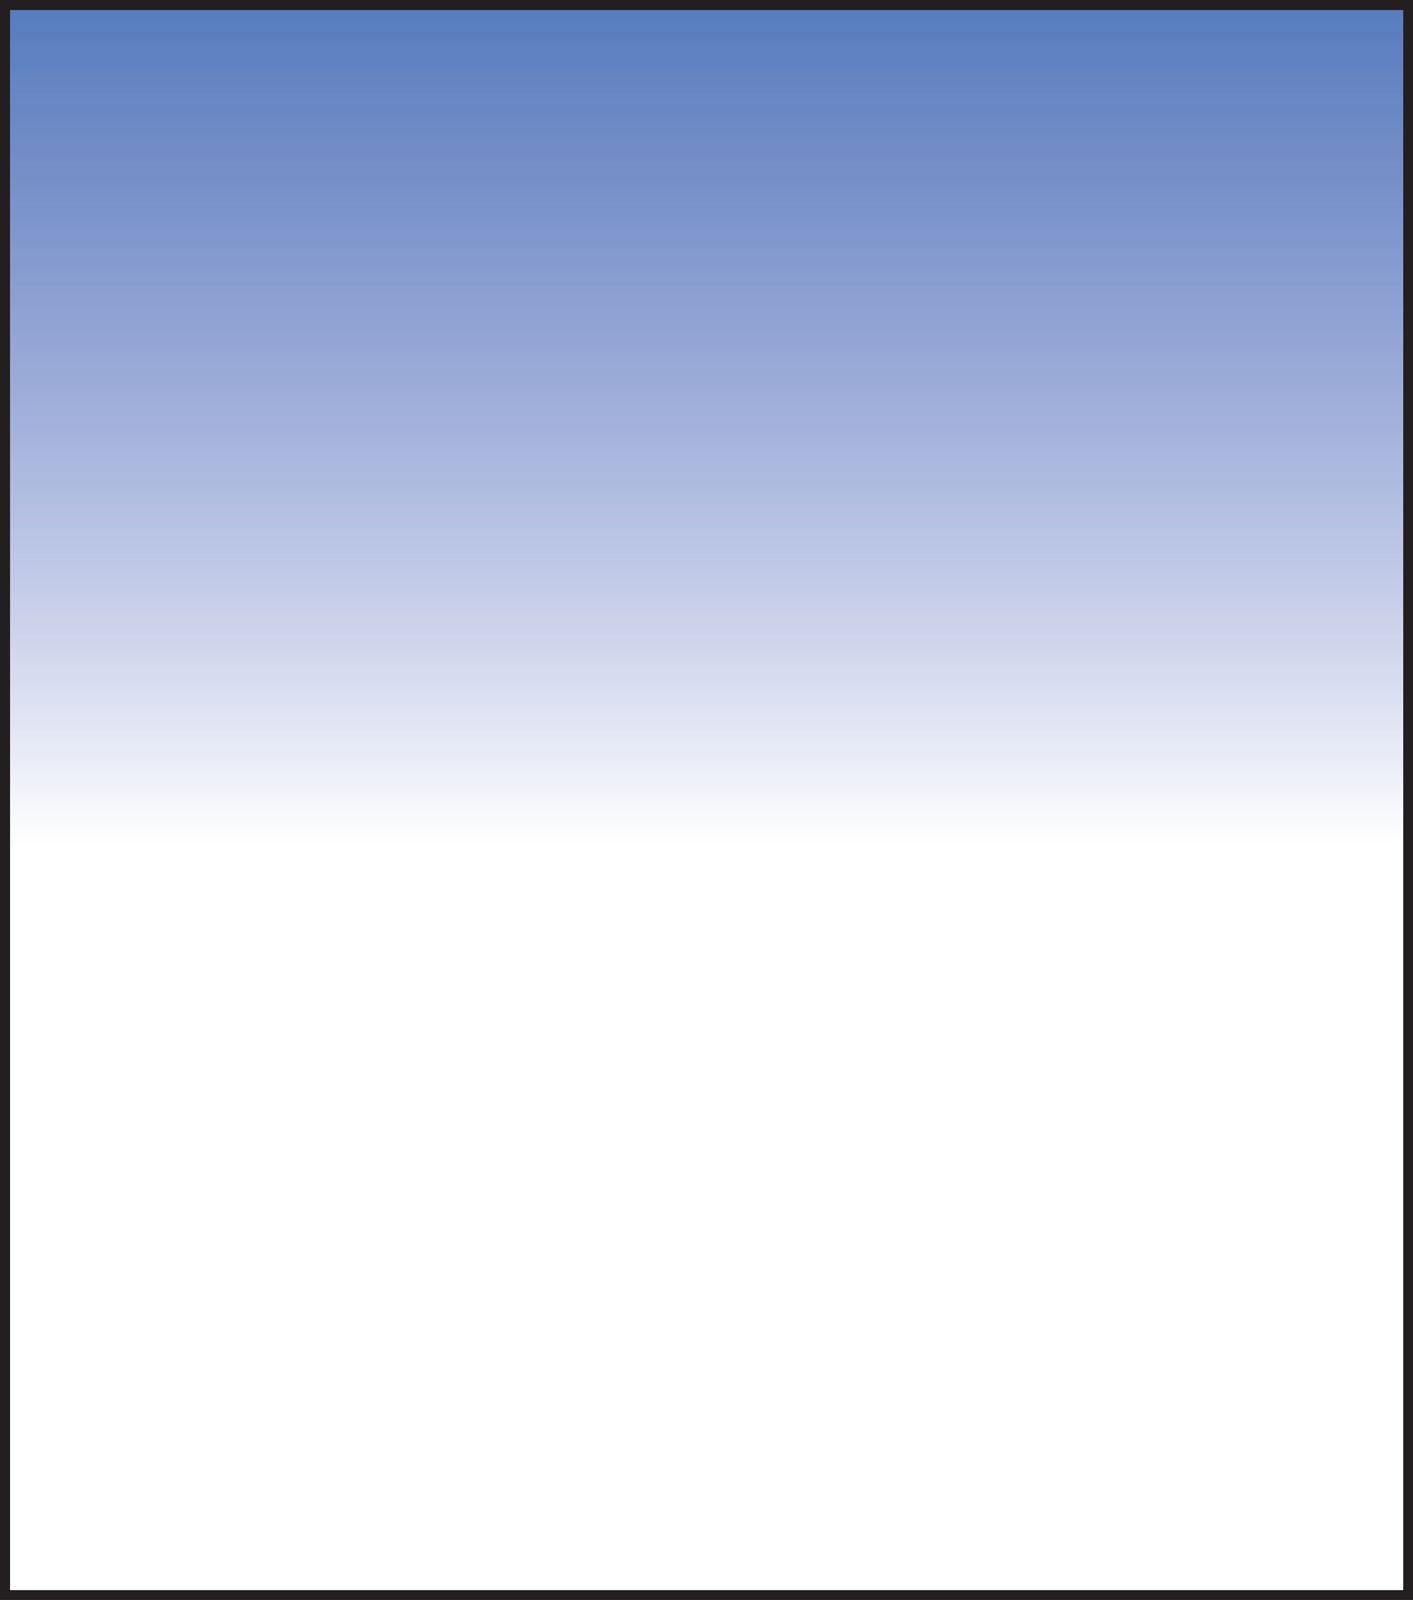 SW150-Real-Blue-3-Soft-Grad